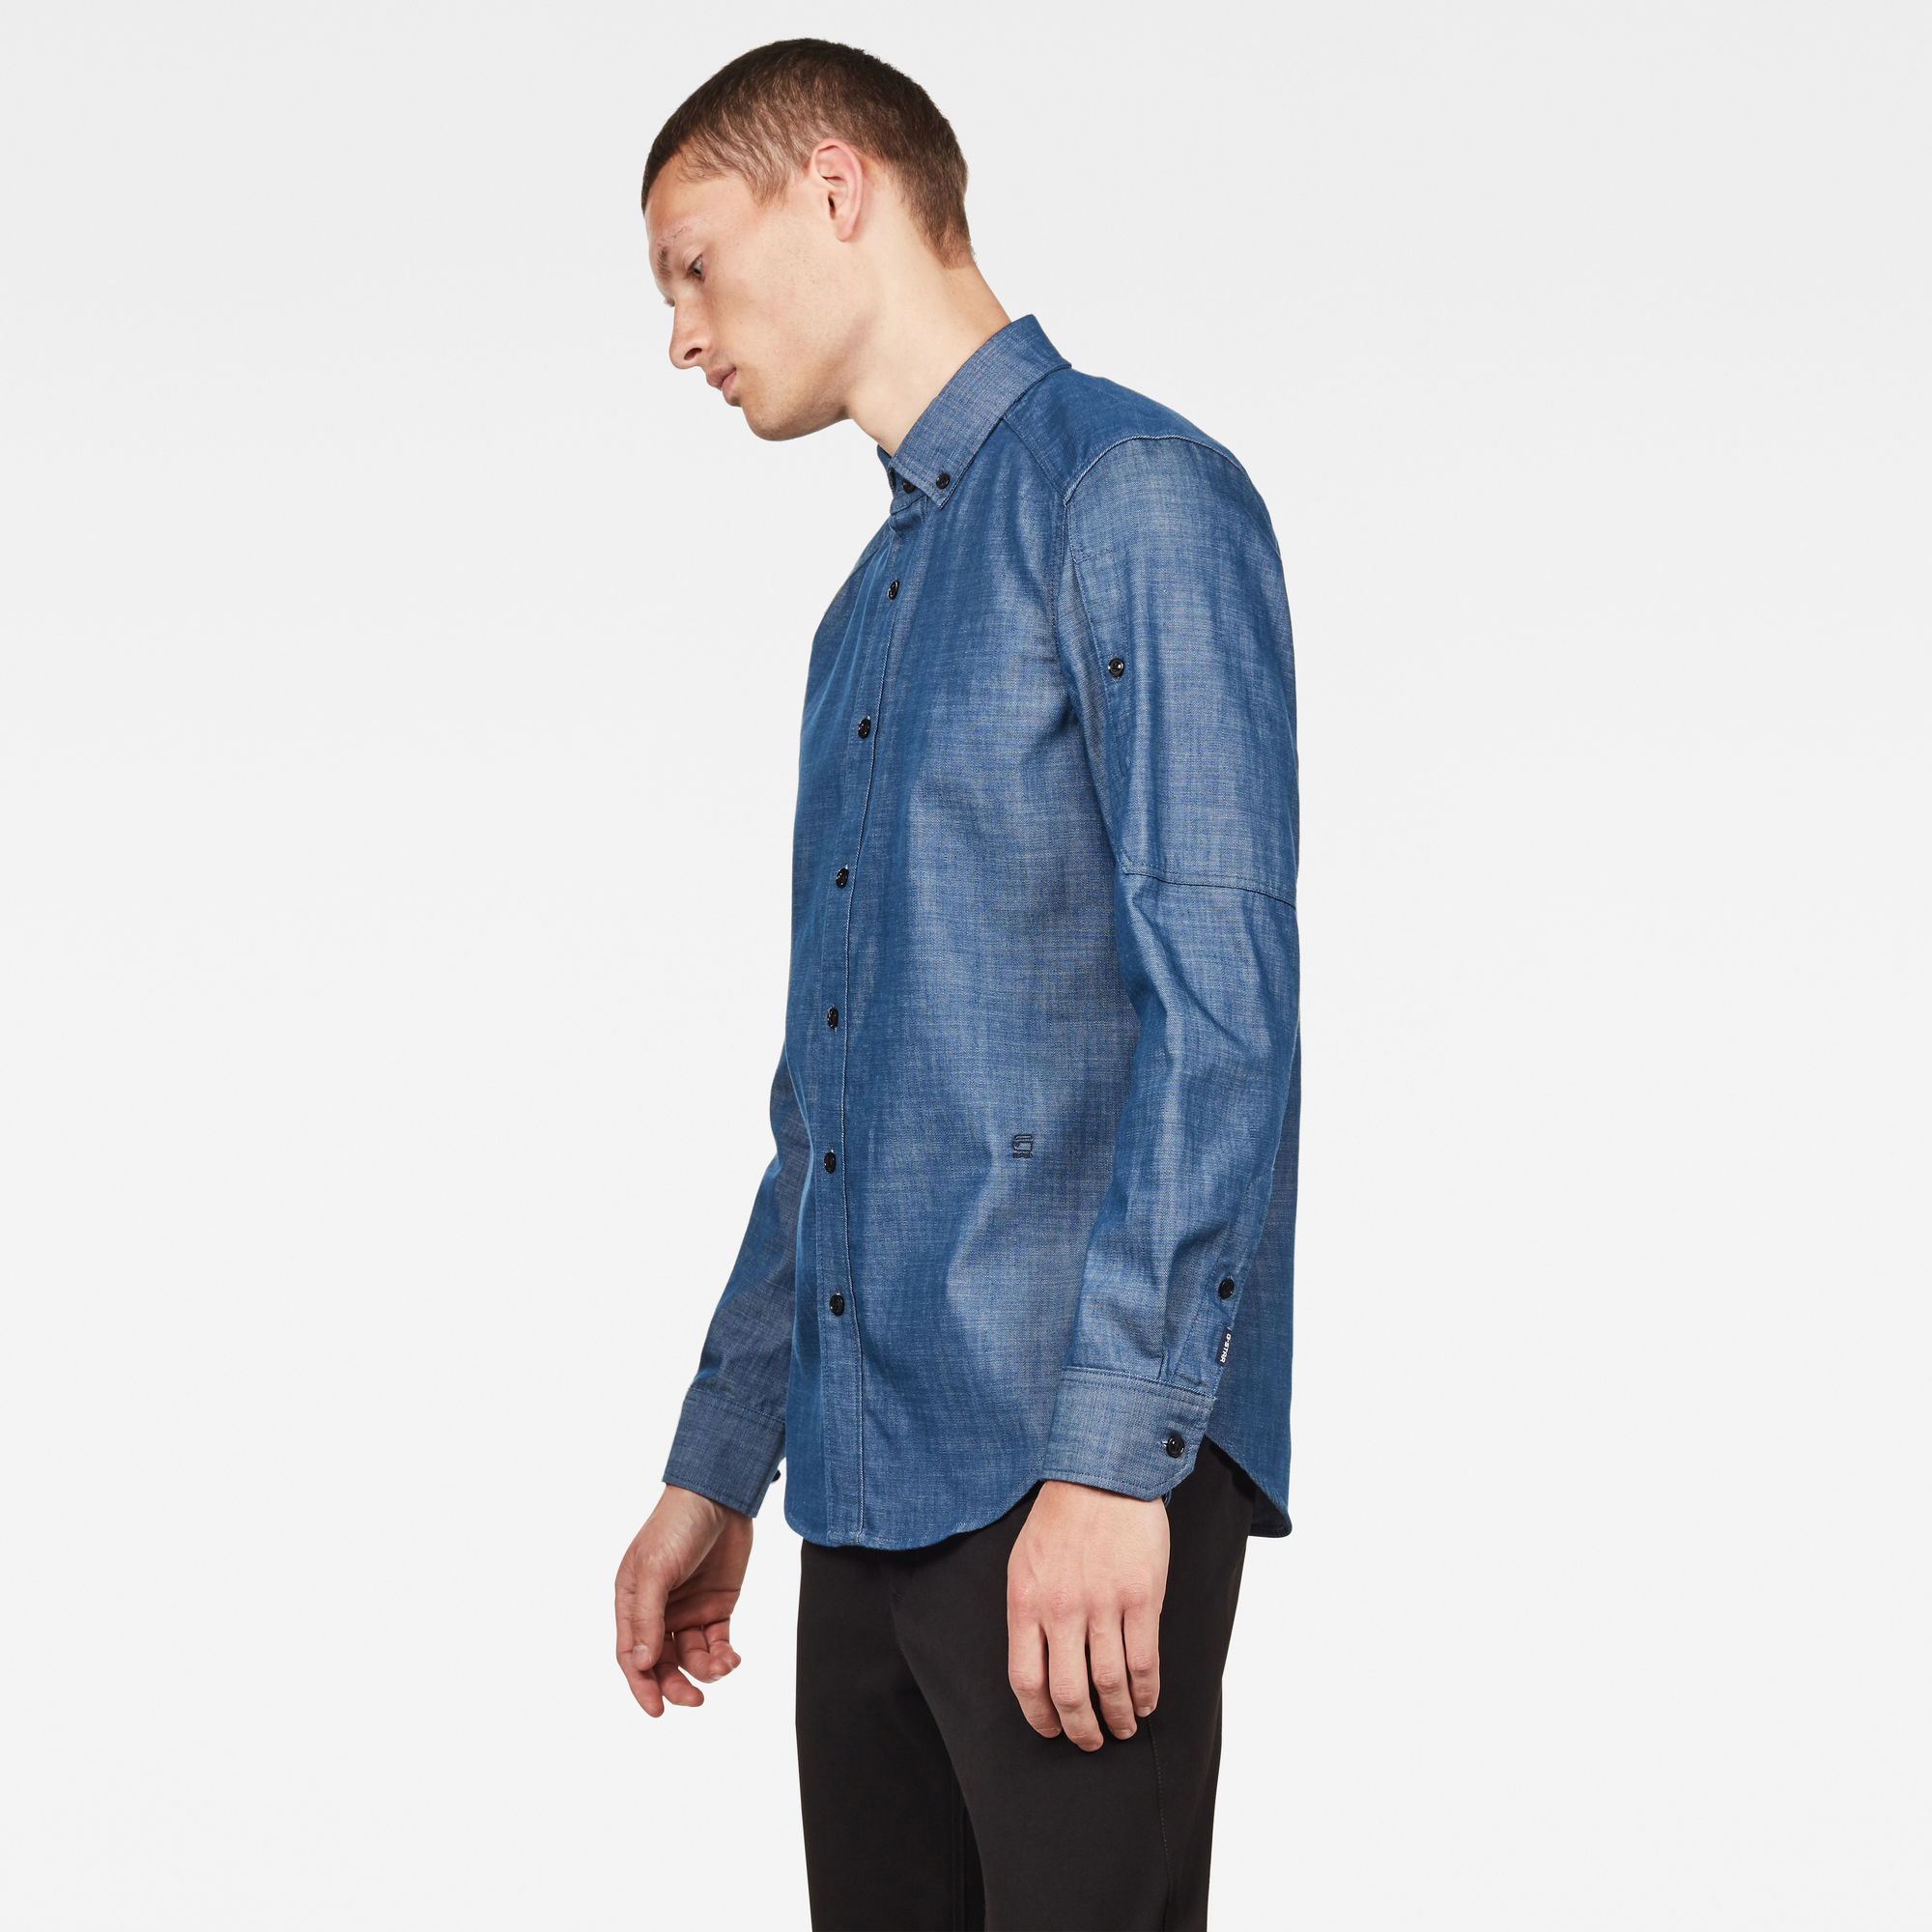 Stalt Pocket Slim Shirt